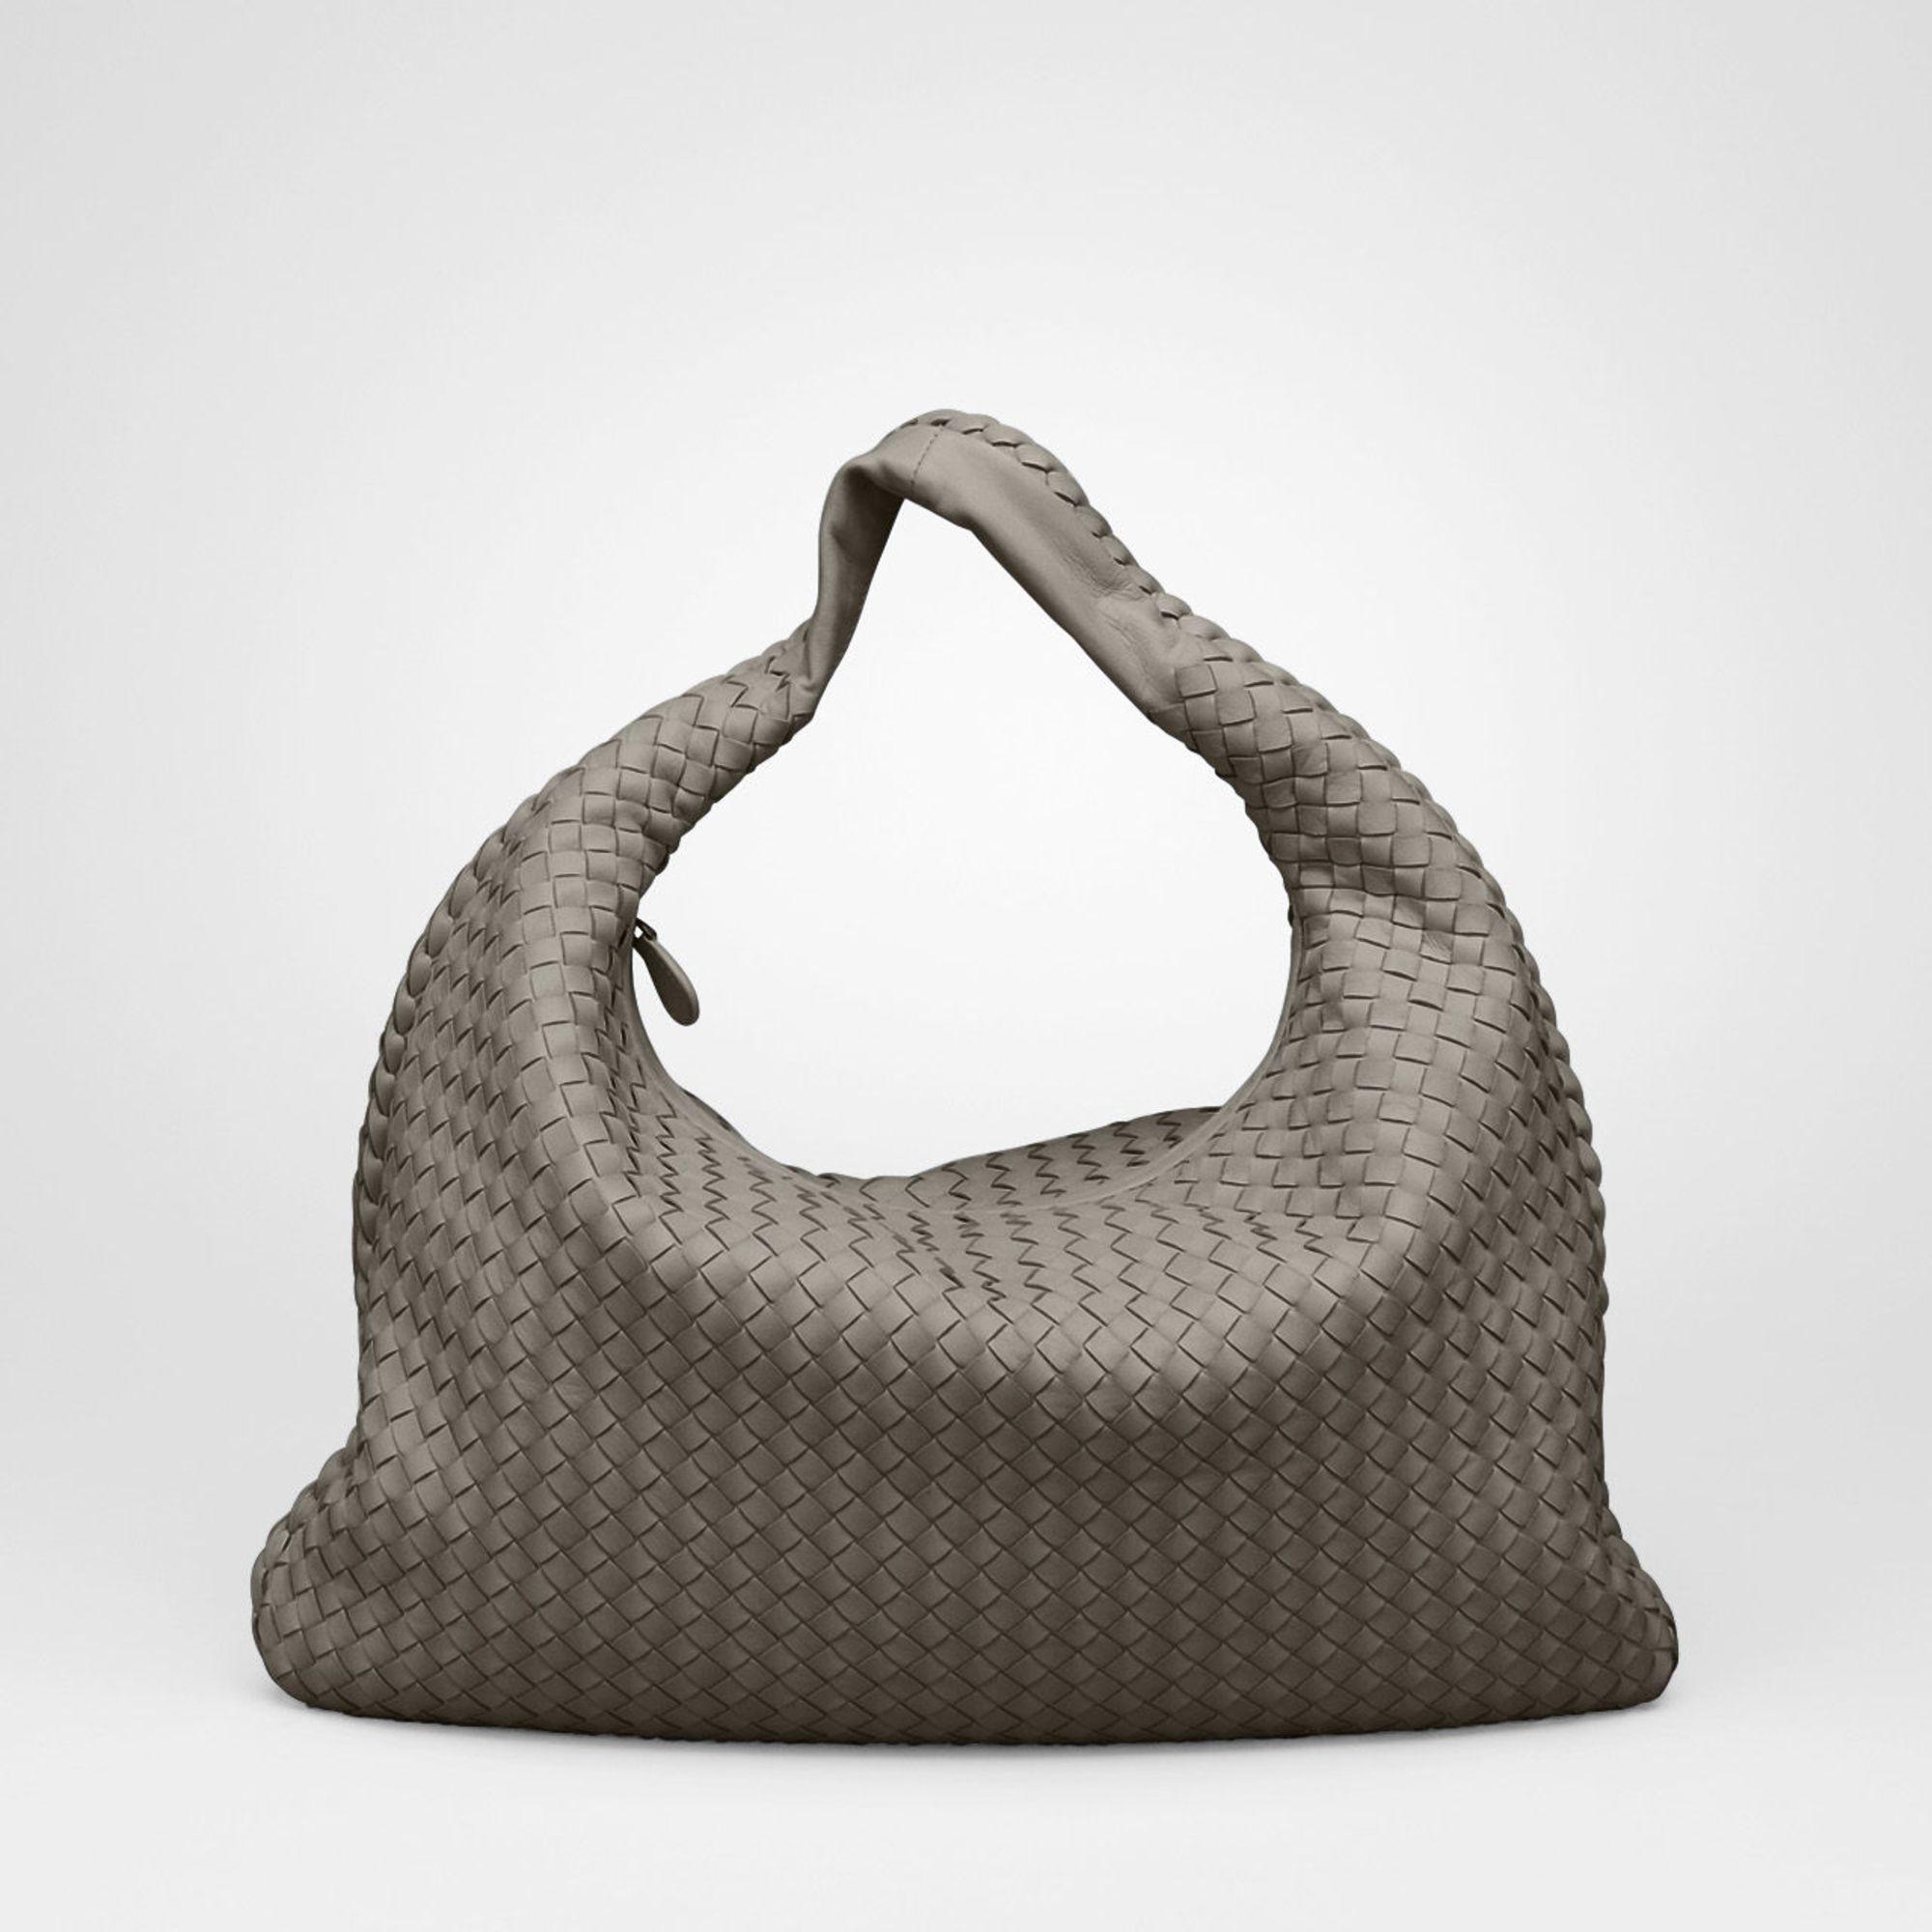 replica prada handbags uk - Bottega veneta Junior Intrecciato Nappa Large Veneta in Gray ...